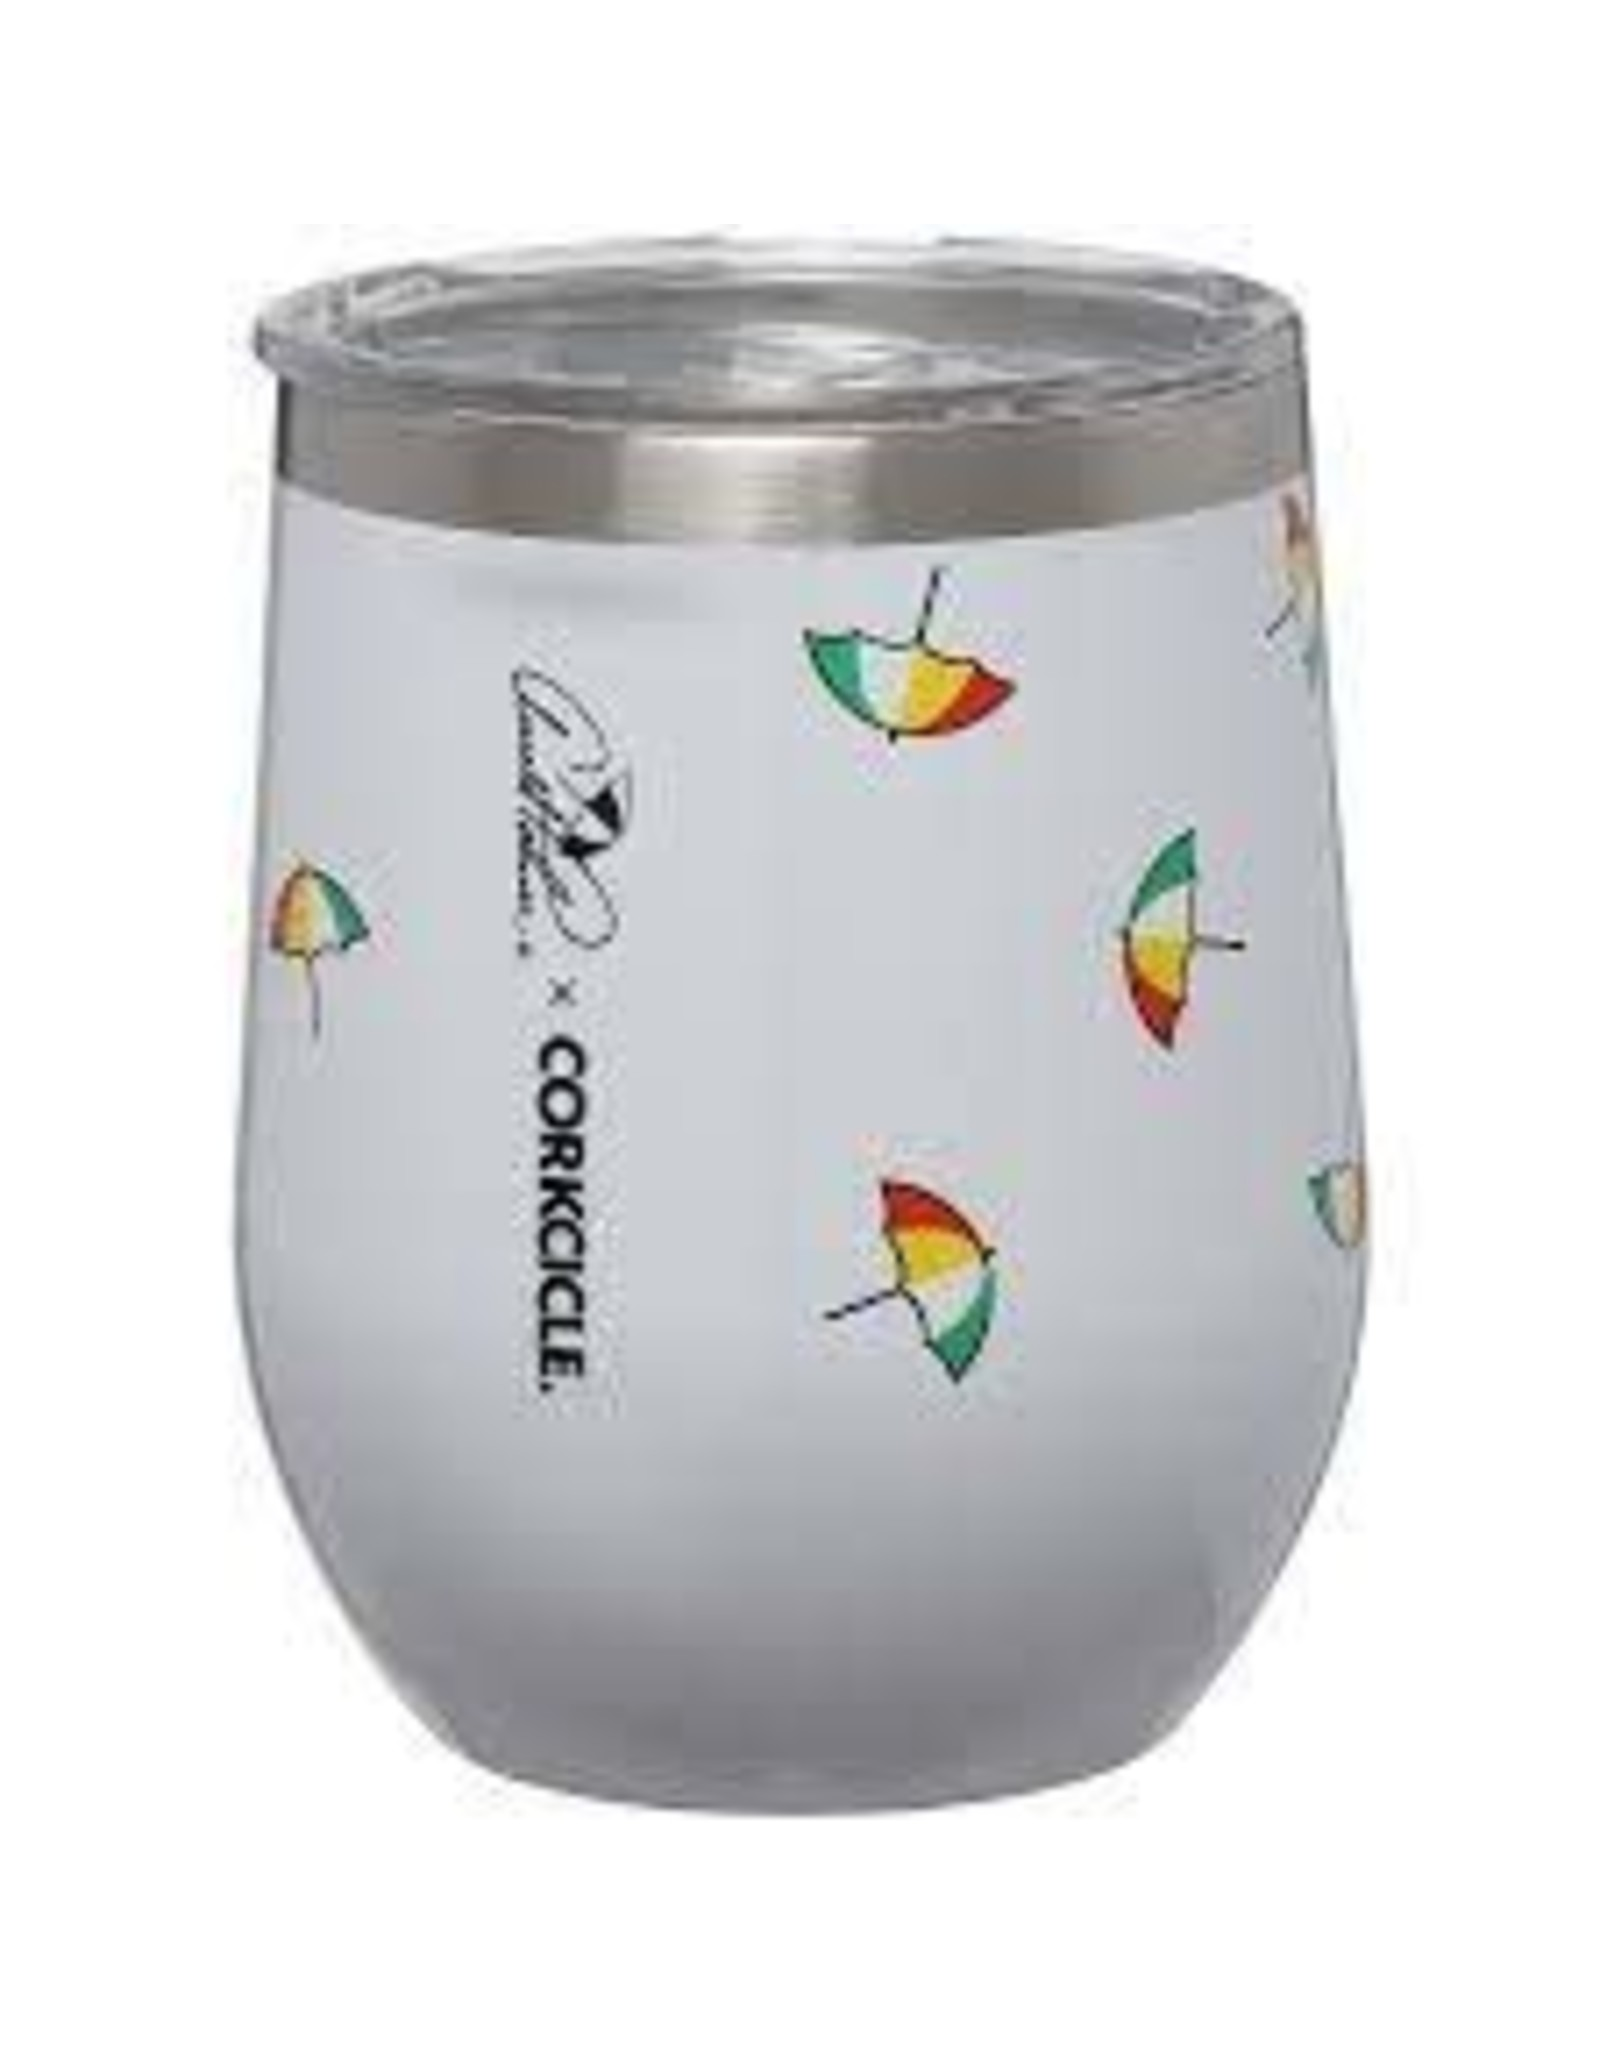 Corkcicle CORKCICLE- Stemless-12oz Arnold Palmer Tossed Umbrellas